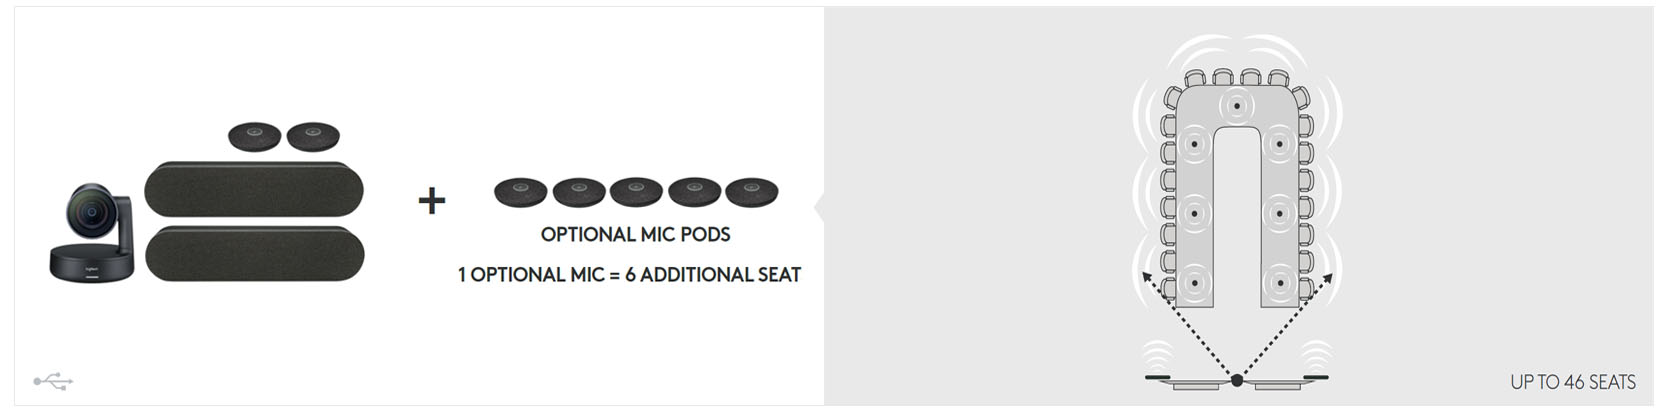 medium and large Rally plus plus optional mic pods